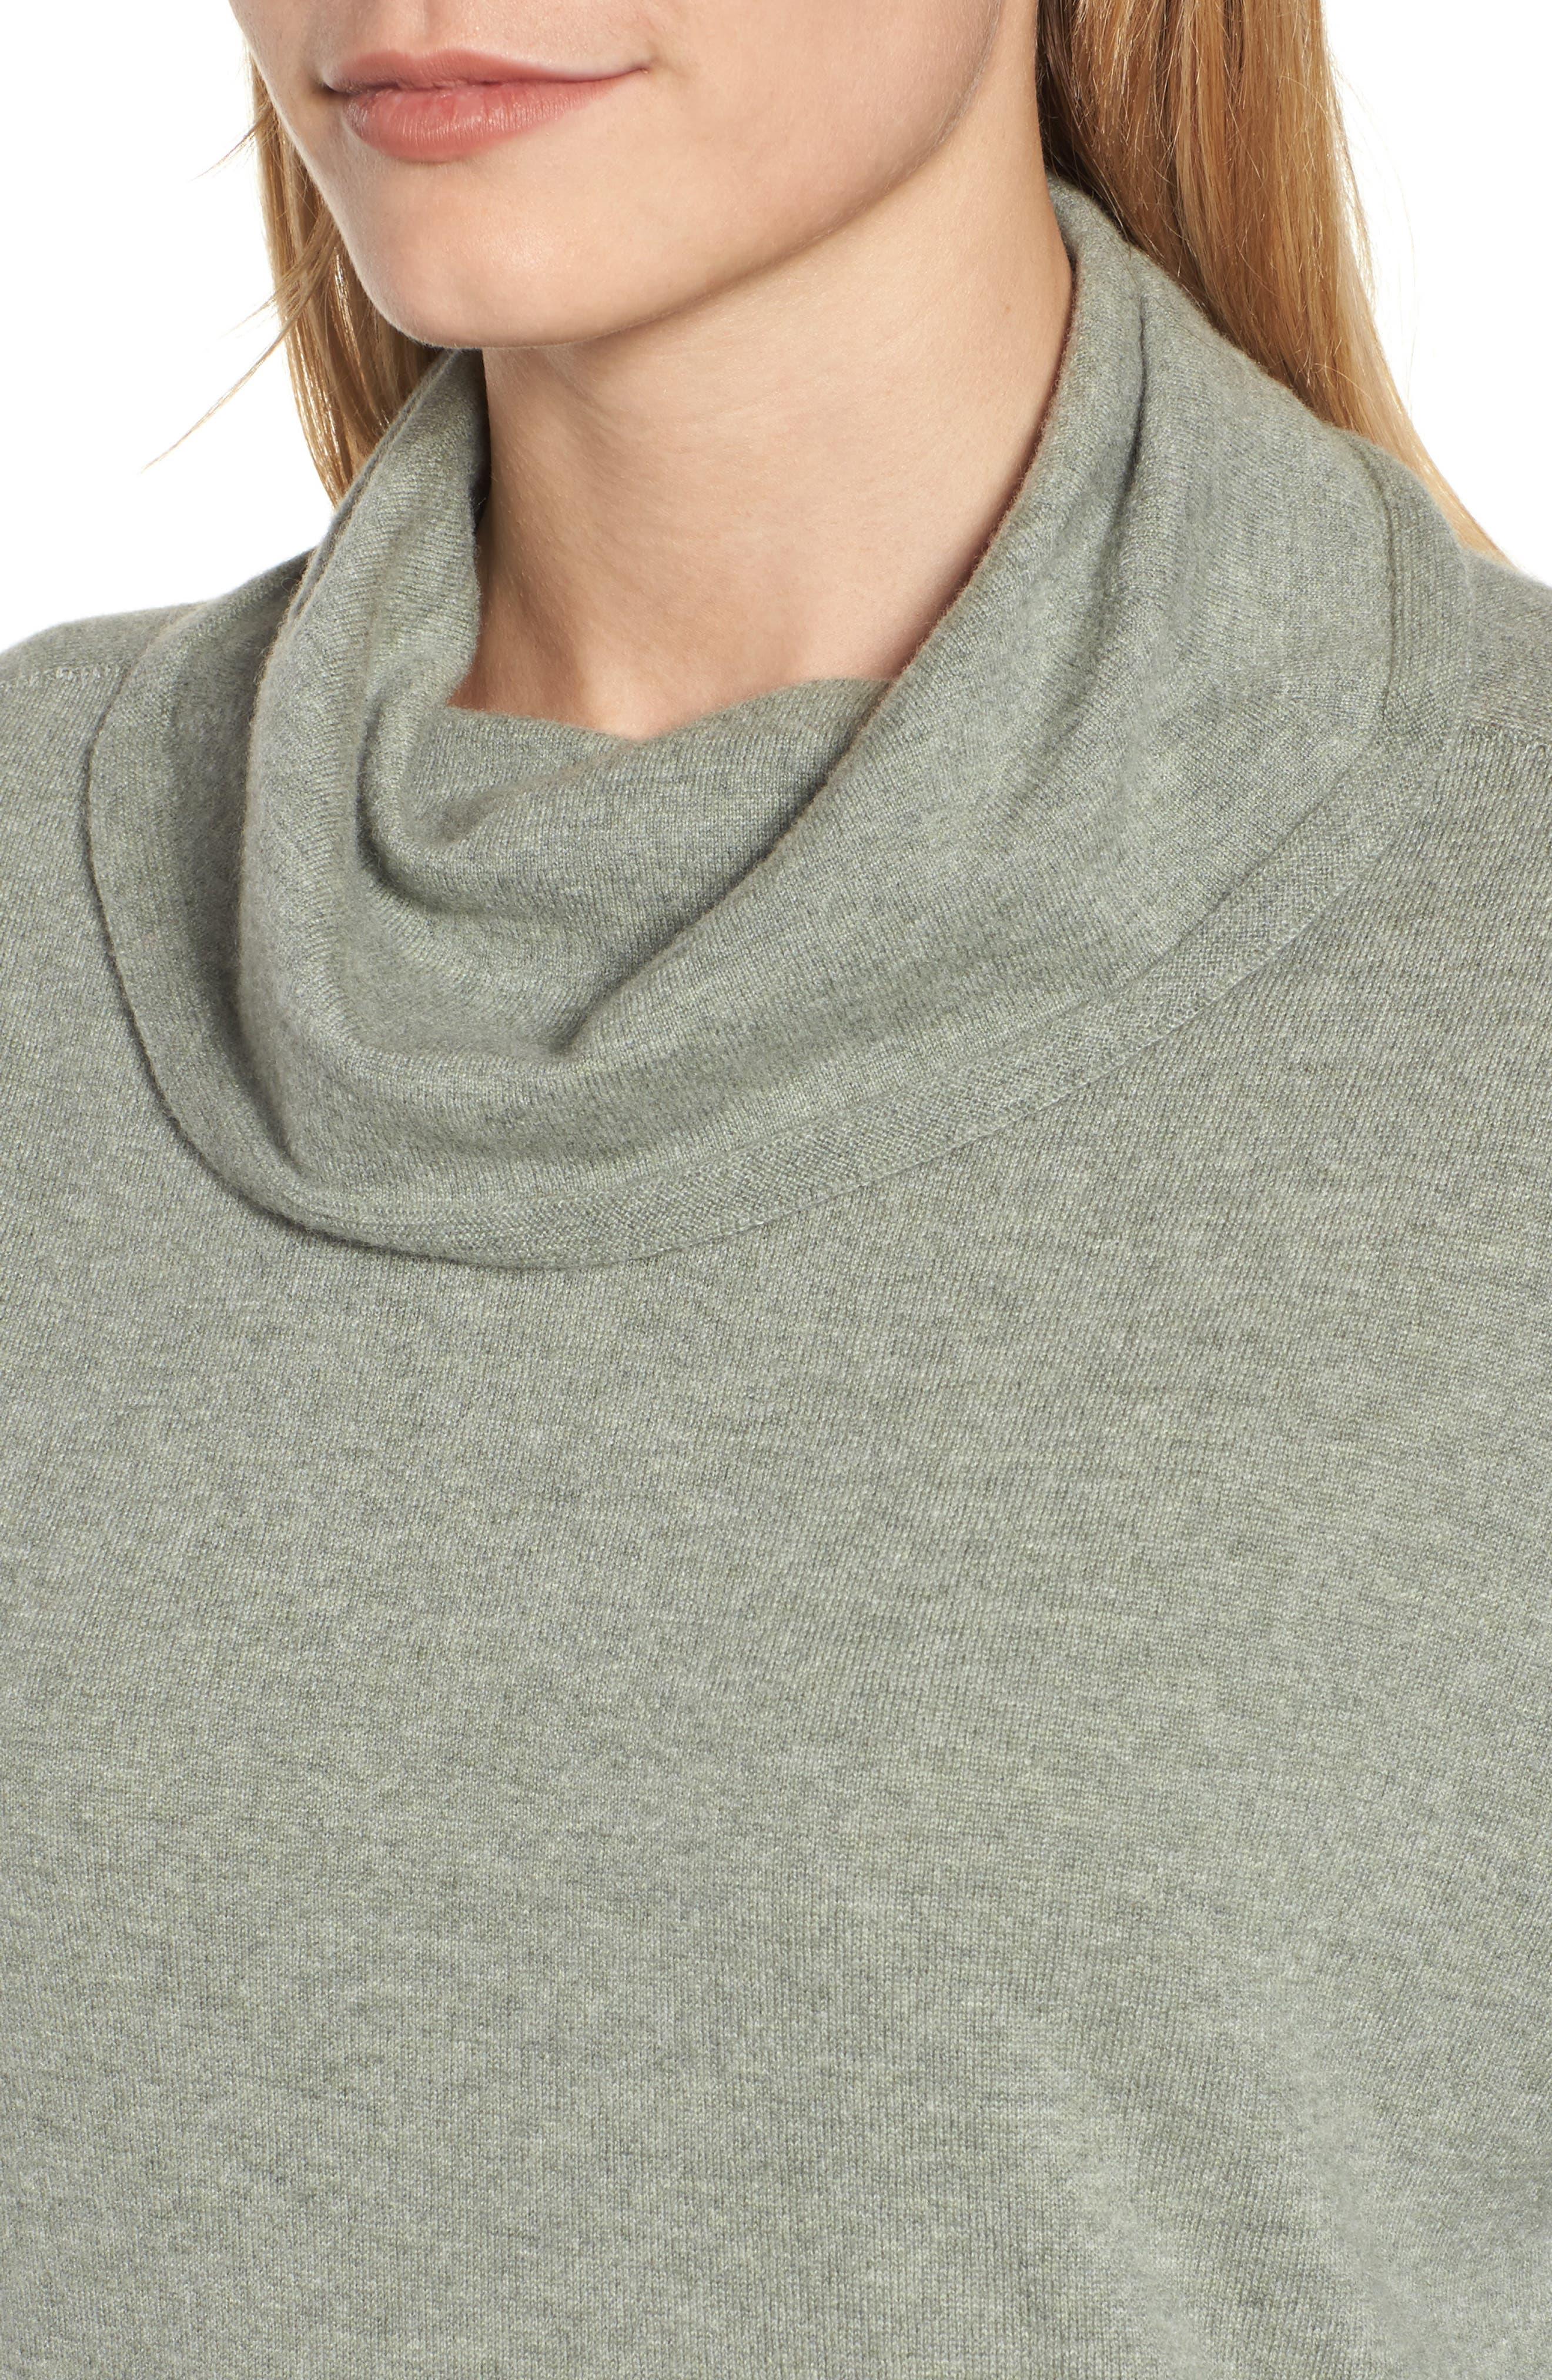 Boxy Cashmere Sweater,                             Alternate thumbnail 4, color,                             094